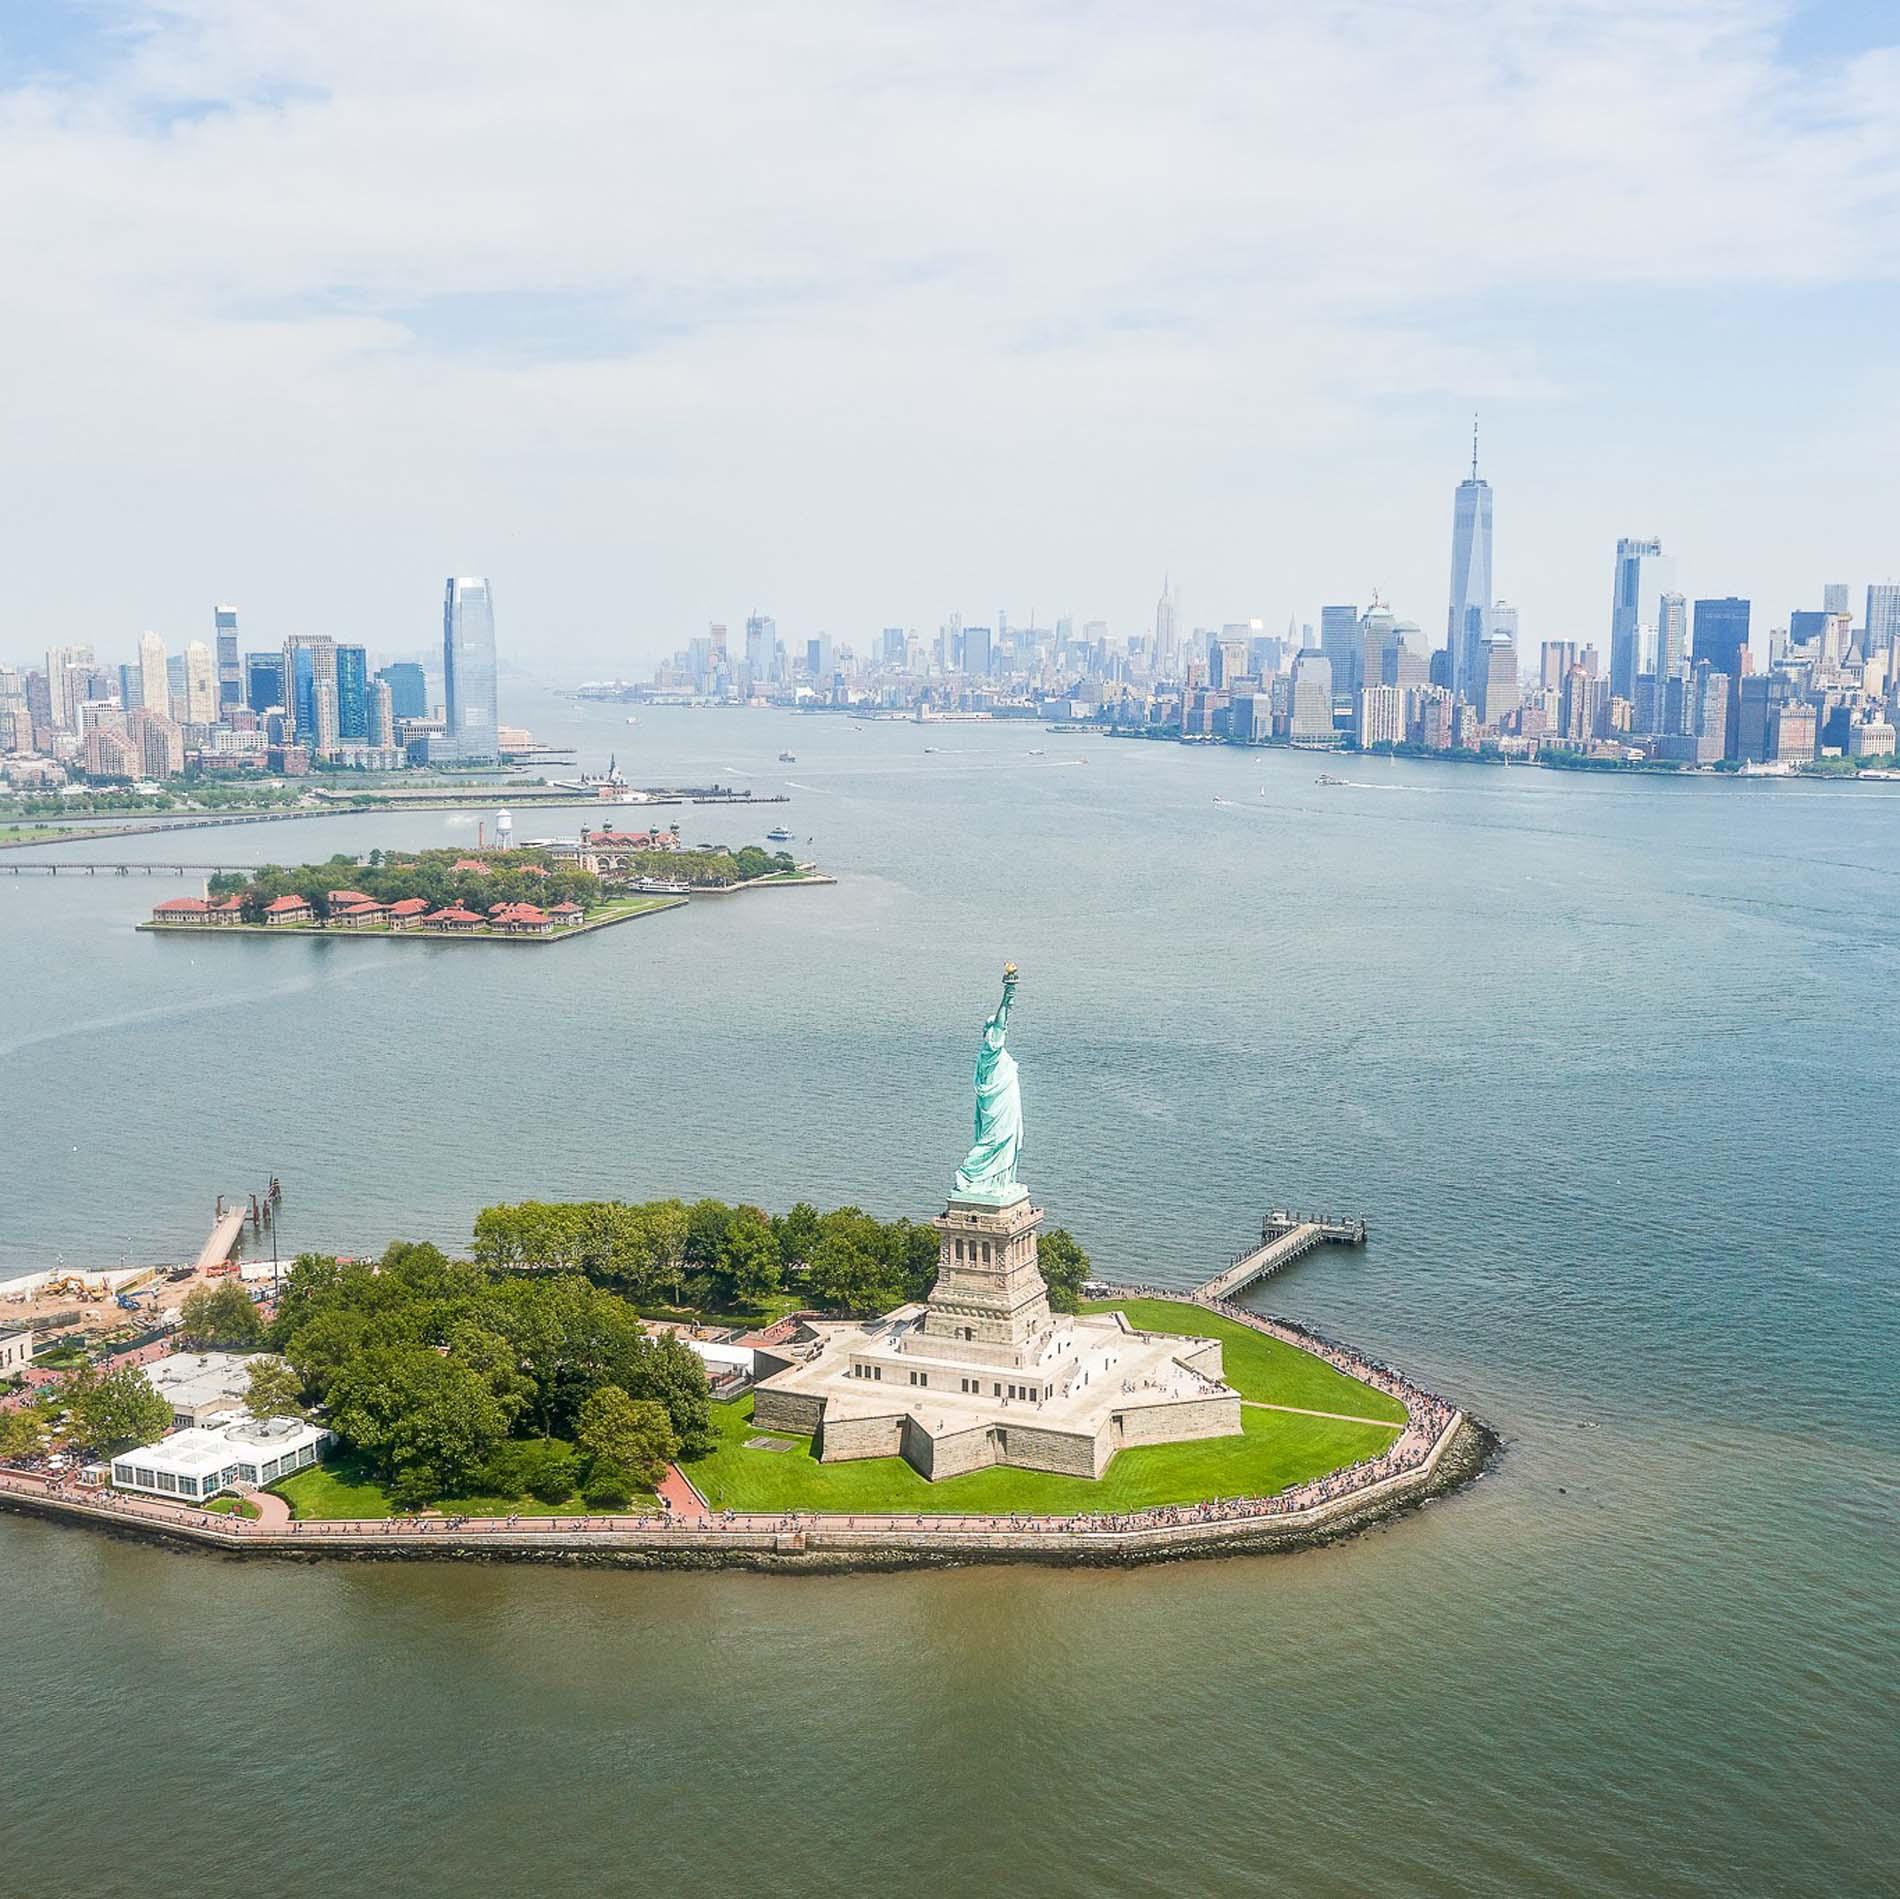 10.1-Statue-of-Liberty-and-Ellis-island-ENVATO-2.jpg